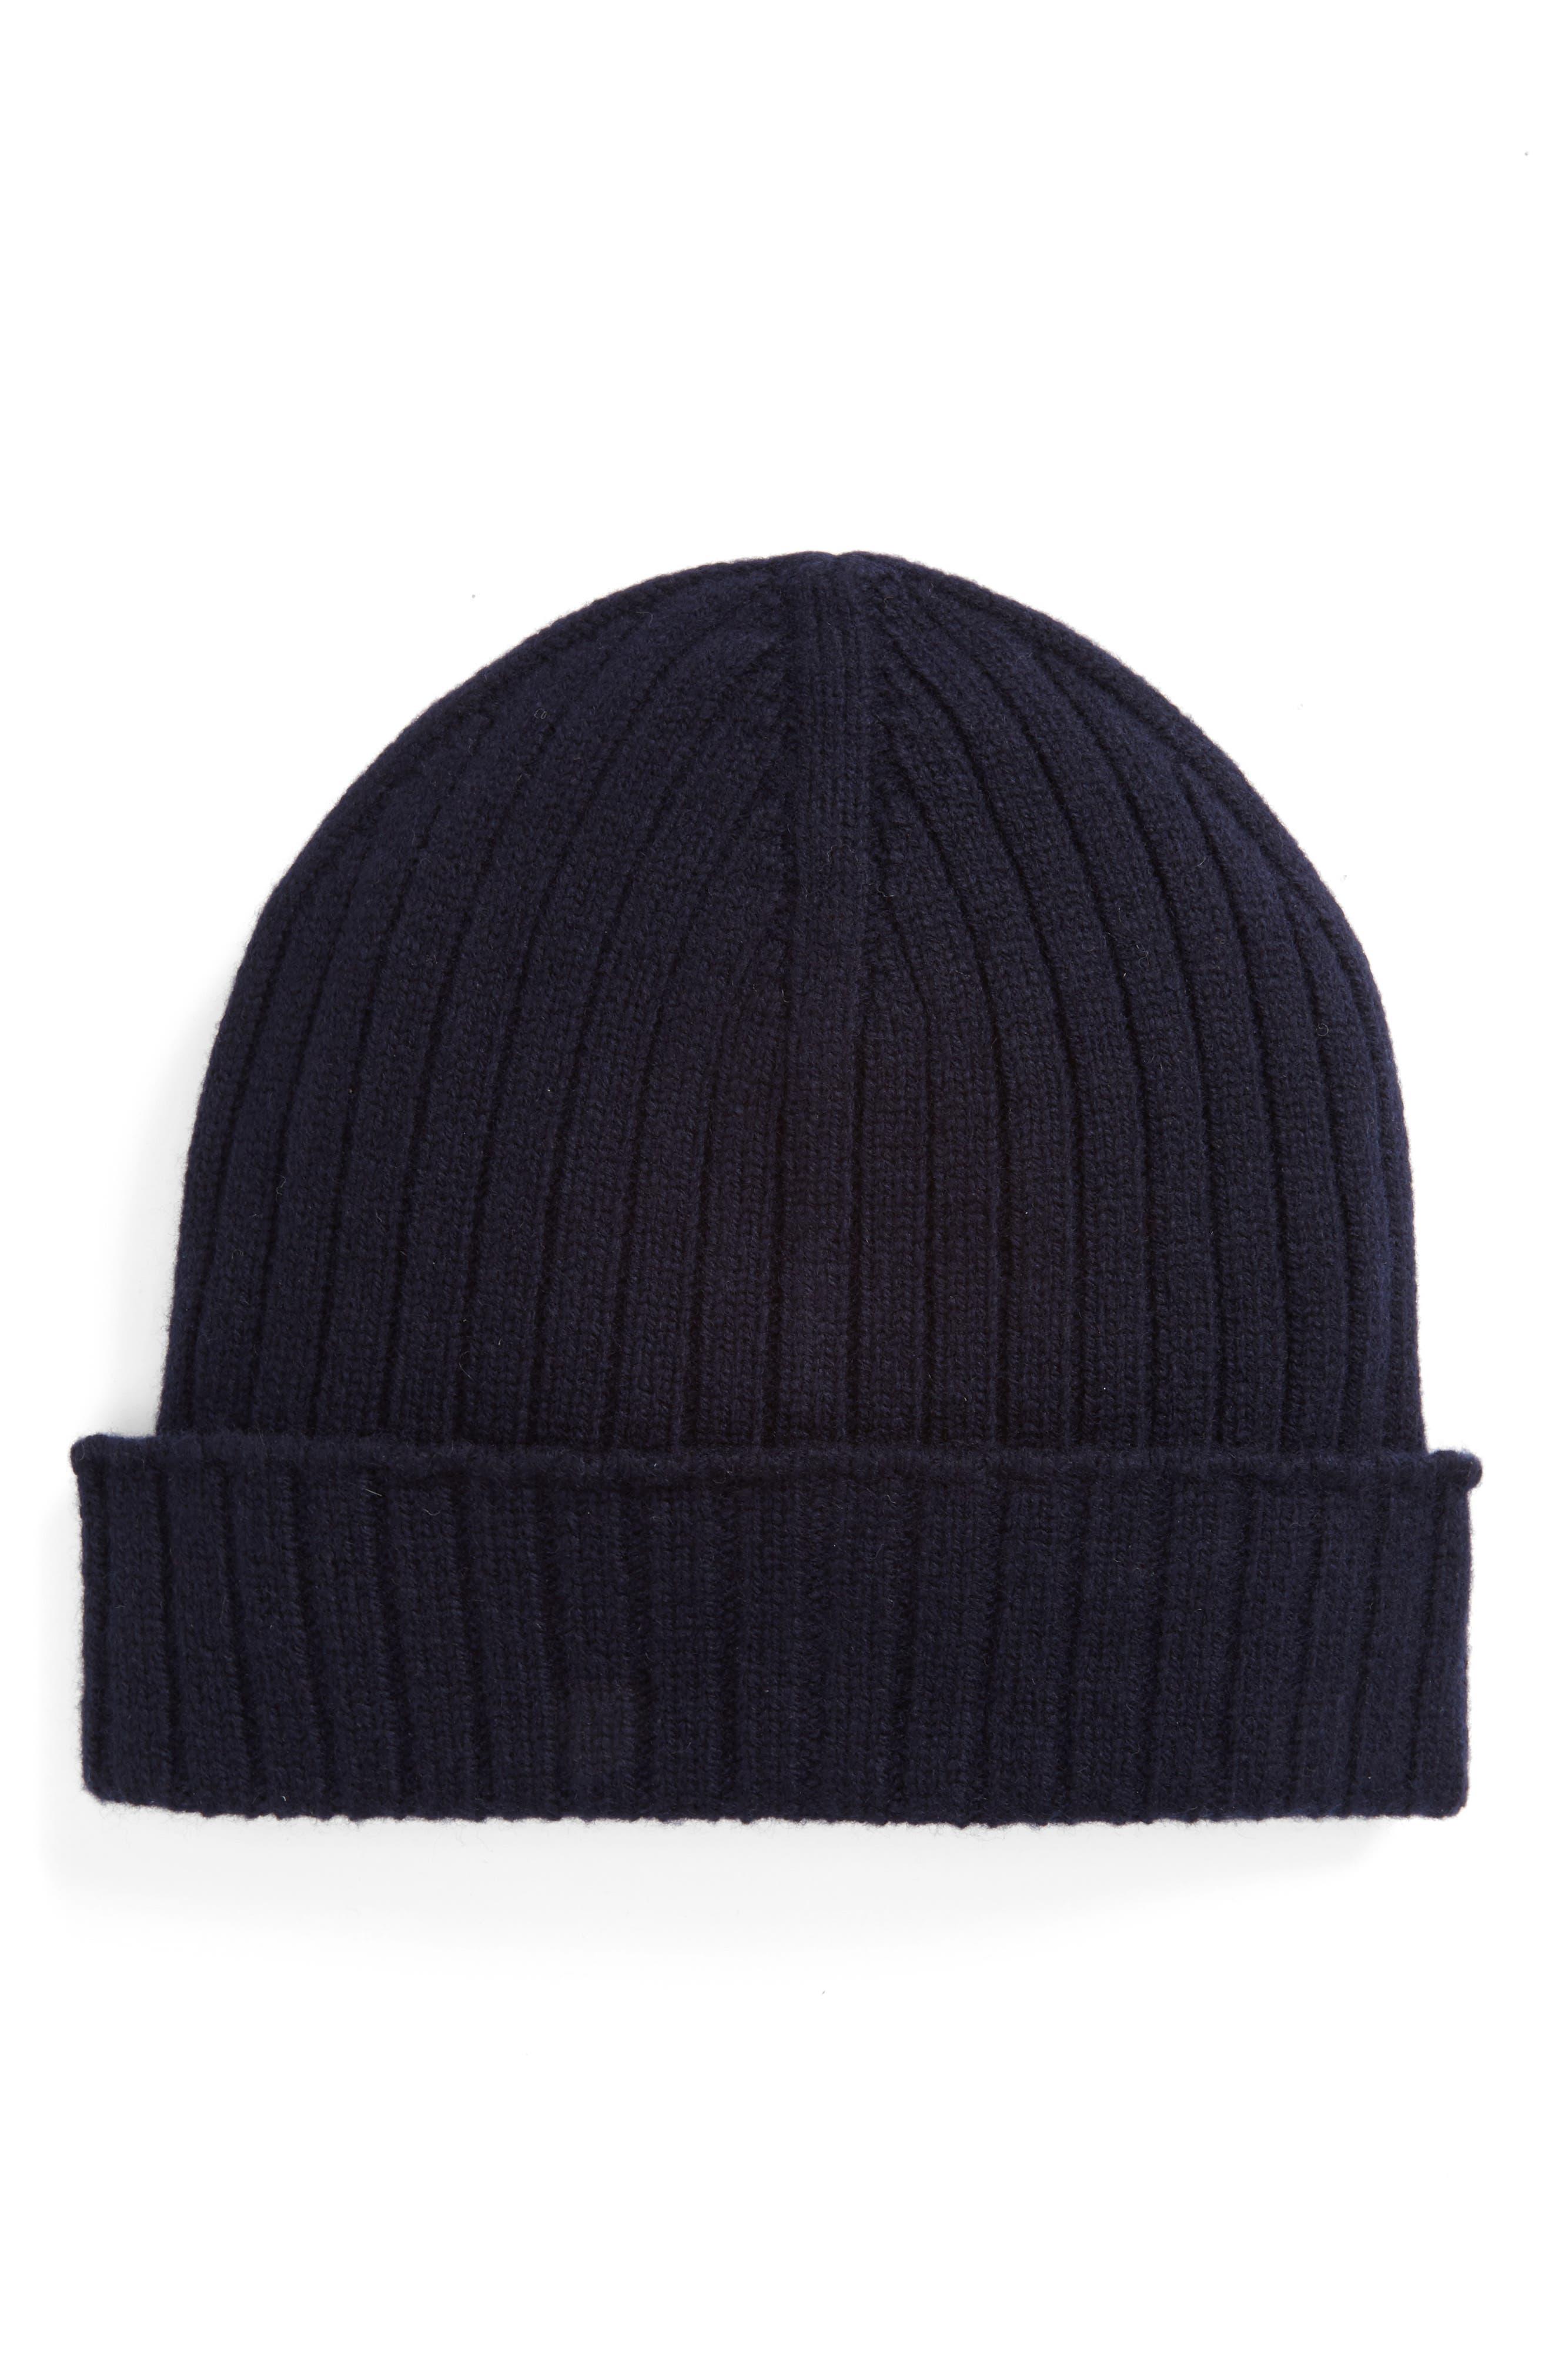 Wool Knit Cap,                             Main thumbnail 3, color,